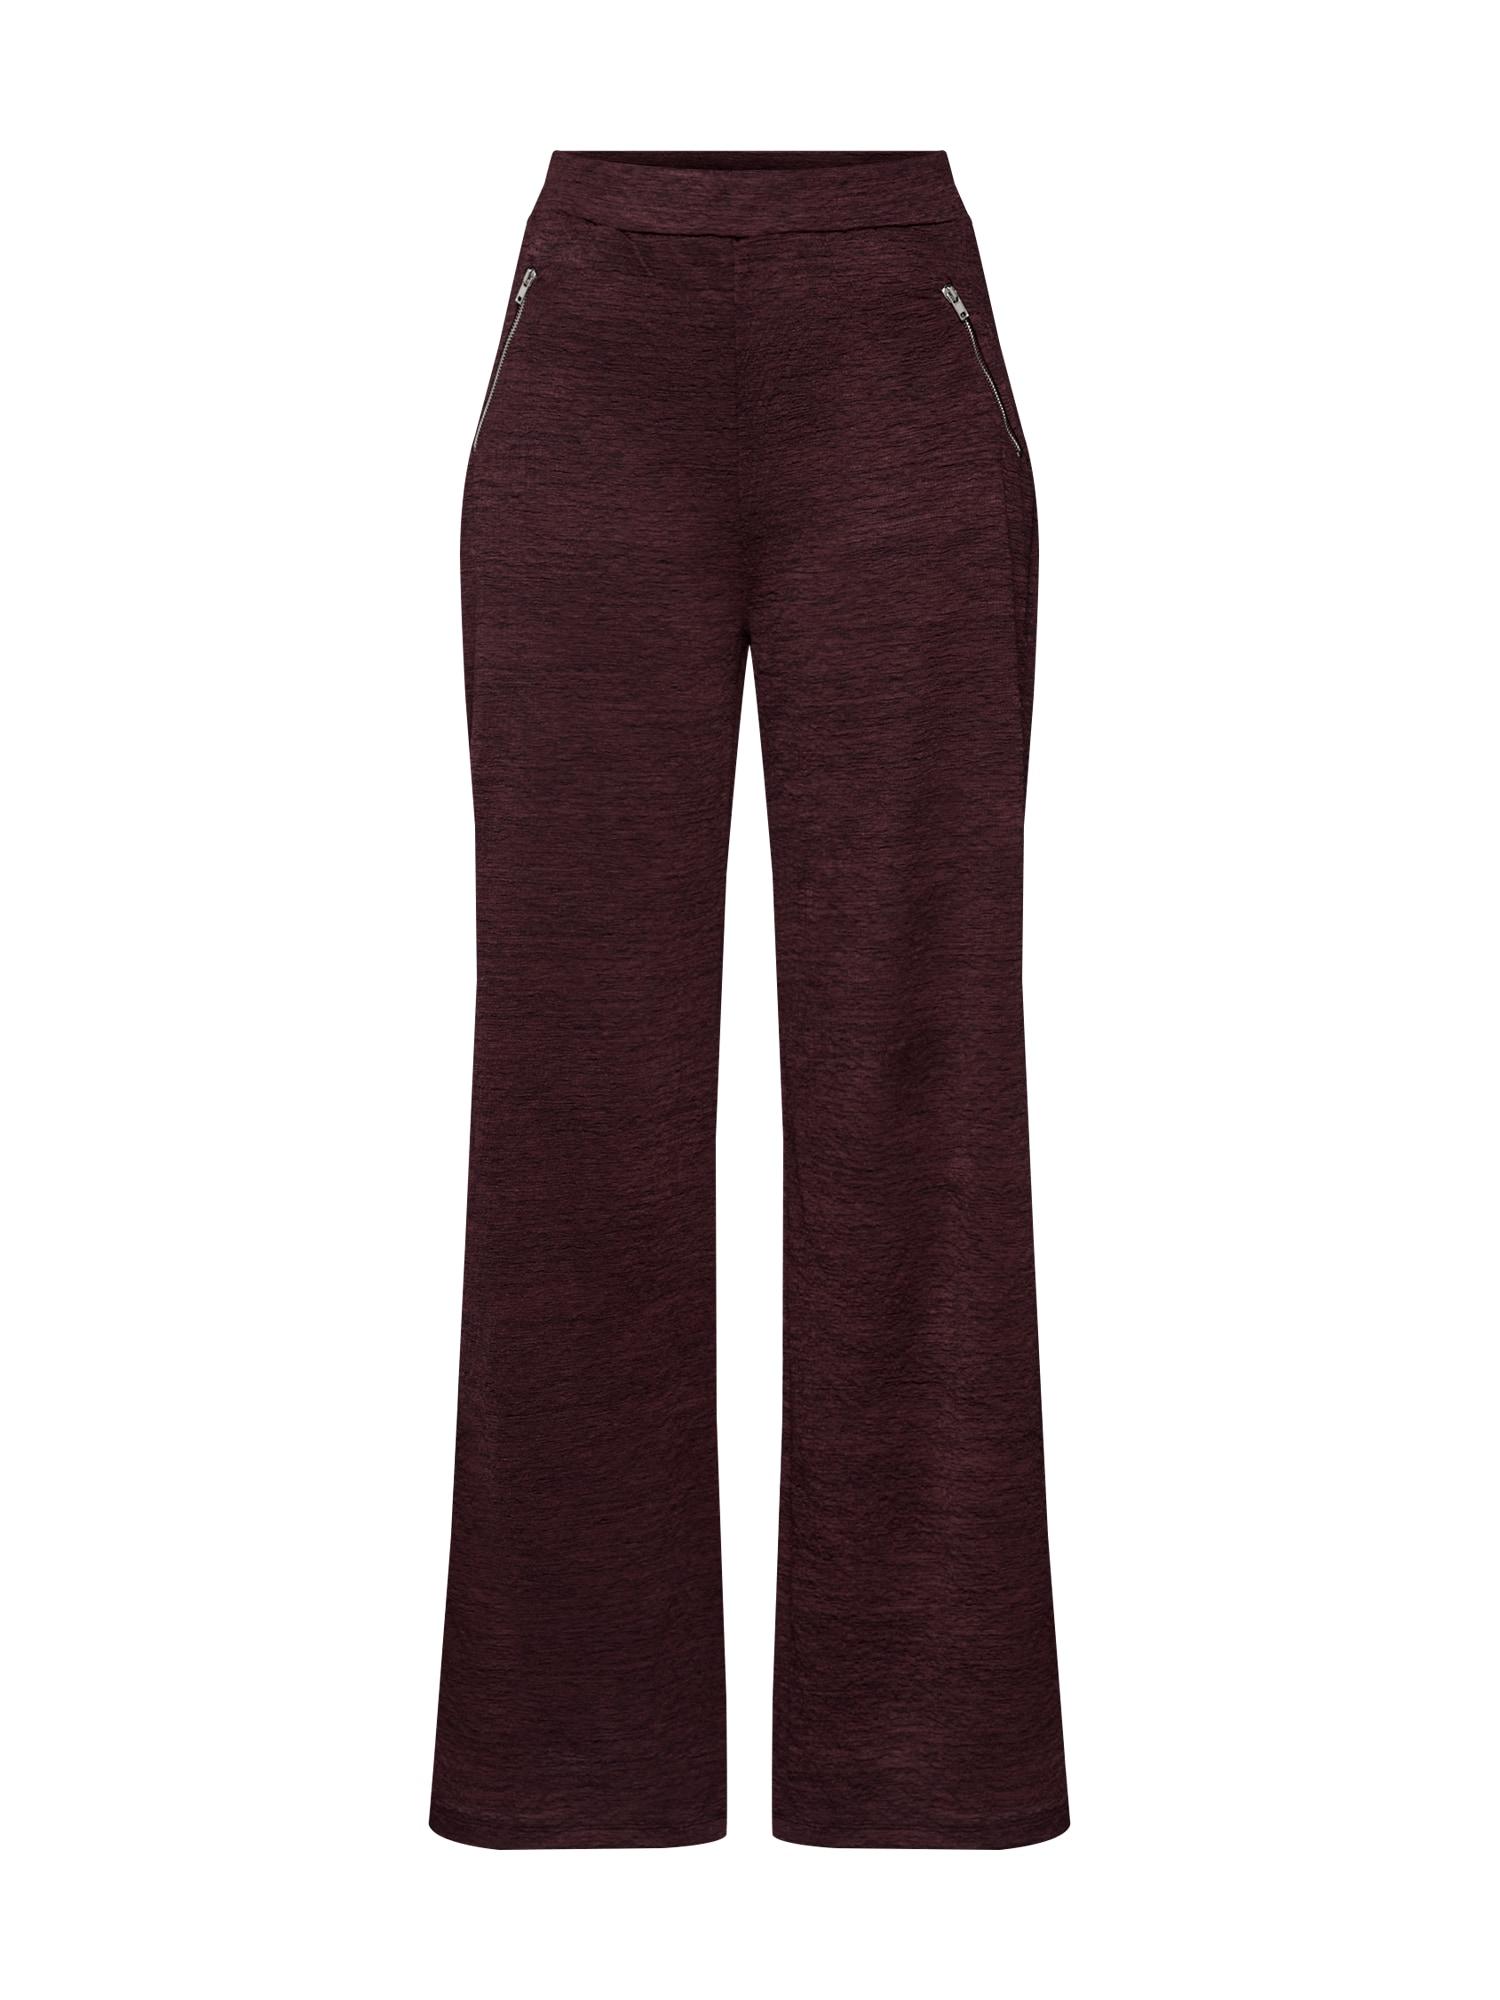 ABOUT YOU Kelnės 'Maxie Trousers' vyšninė spalva